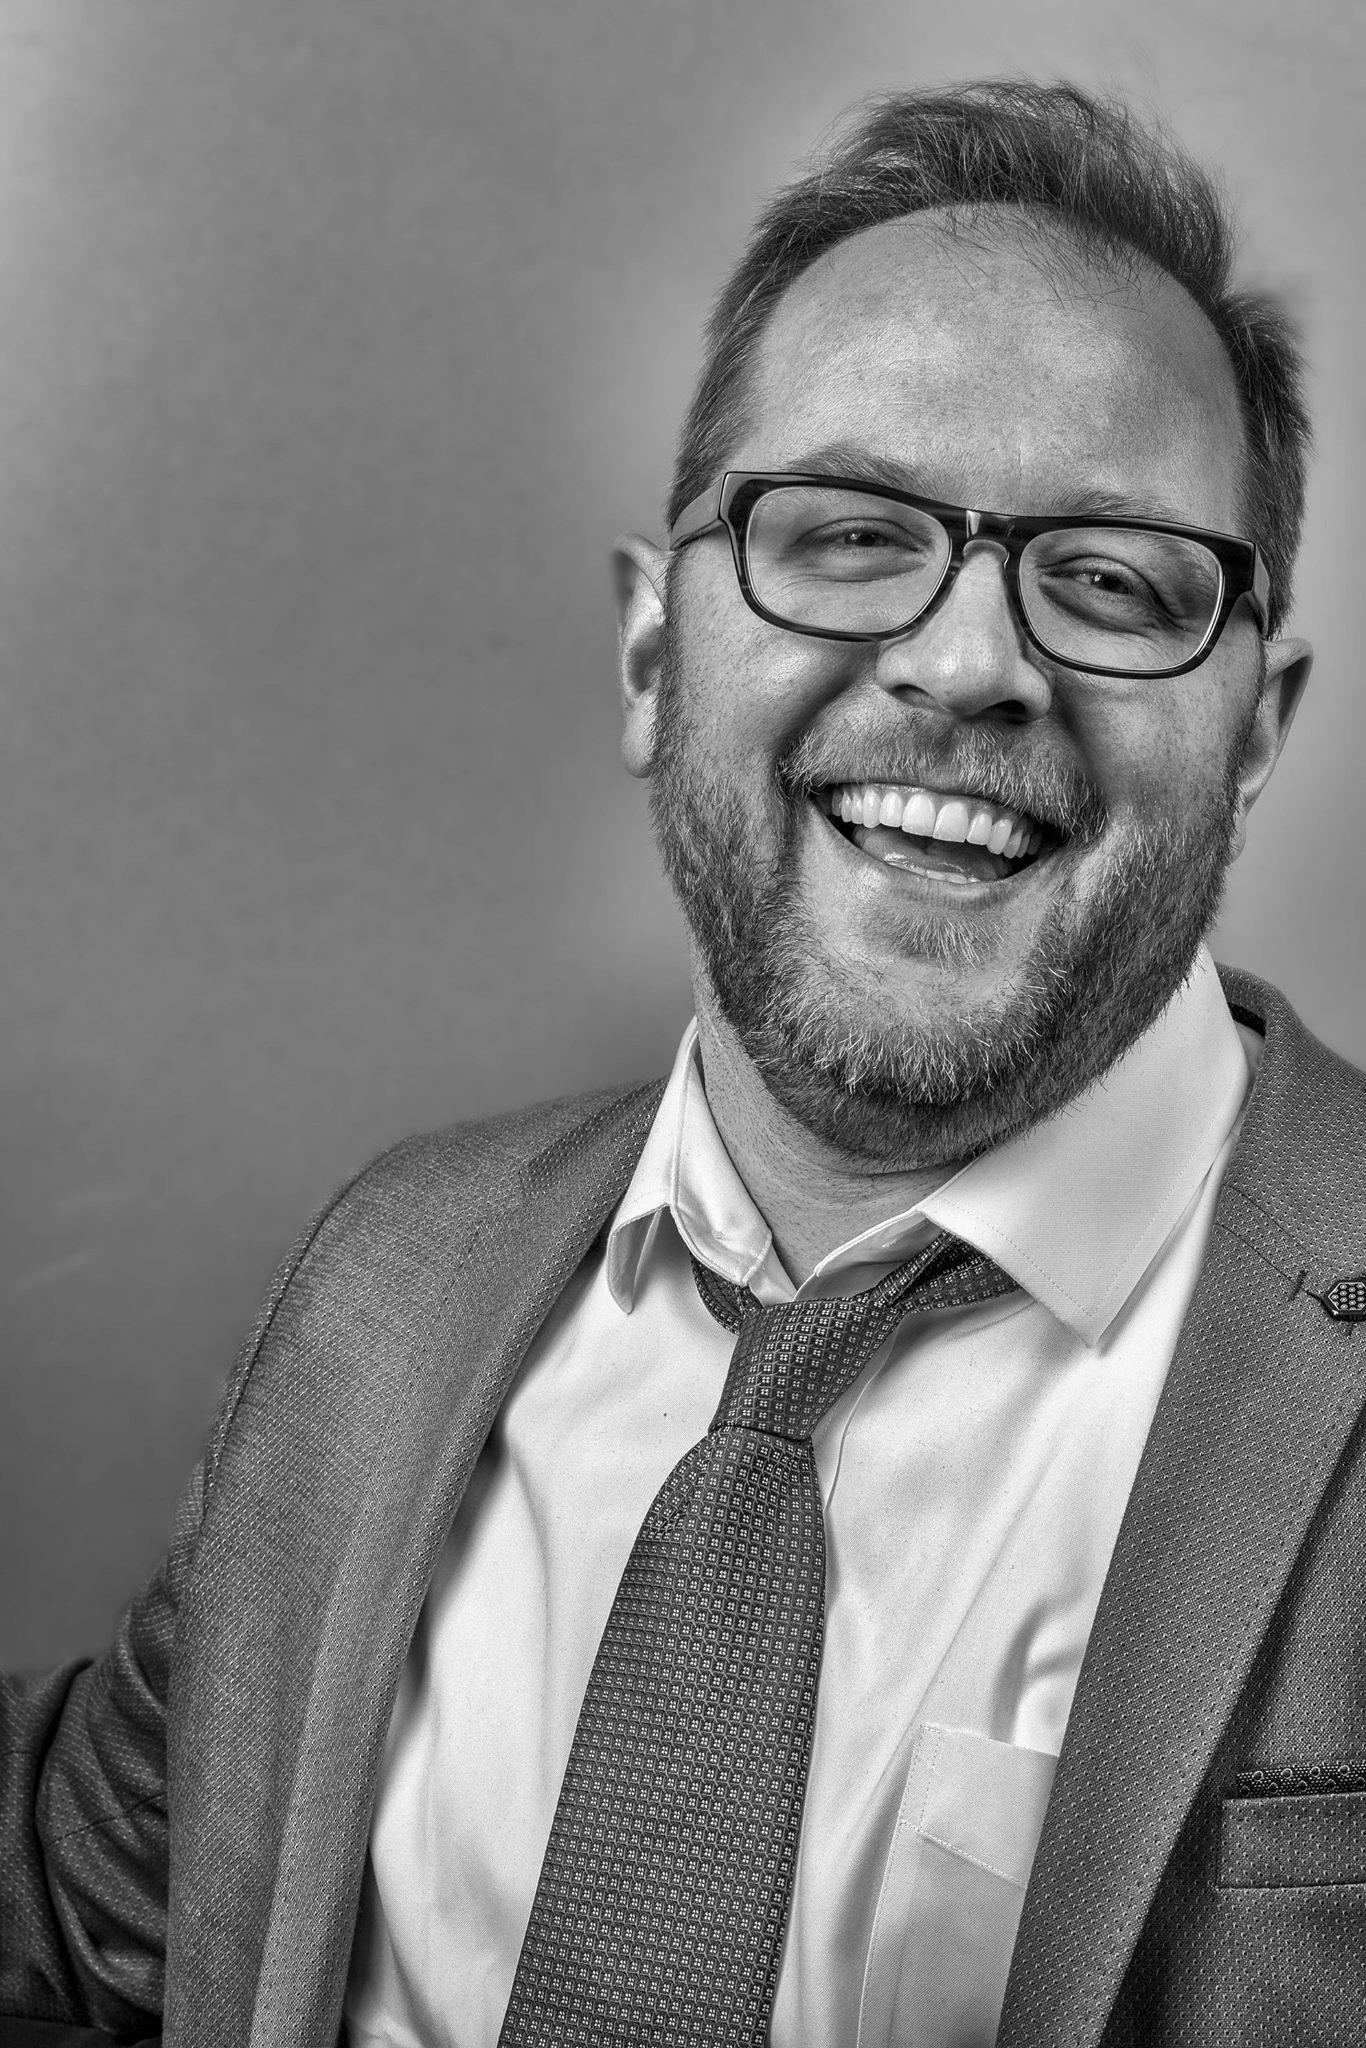 Jason Bobe - Director of Democratized health